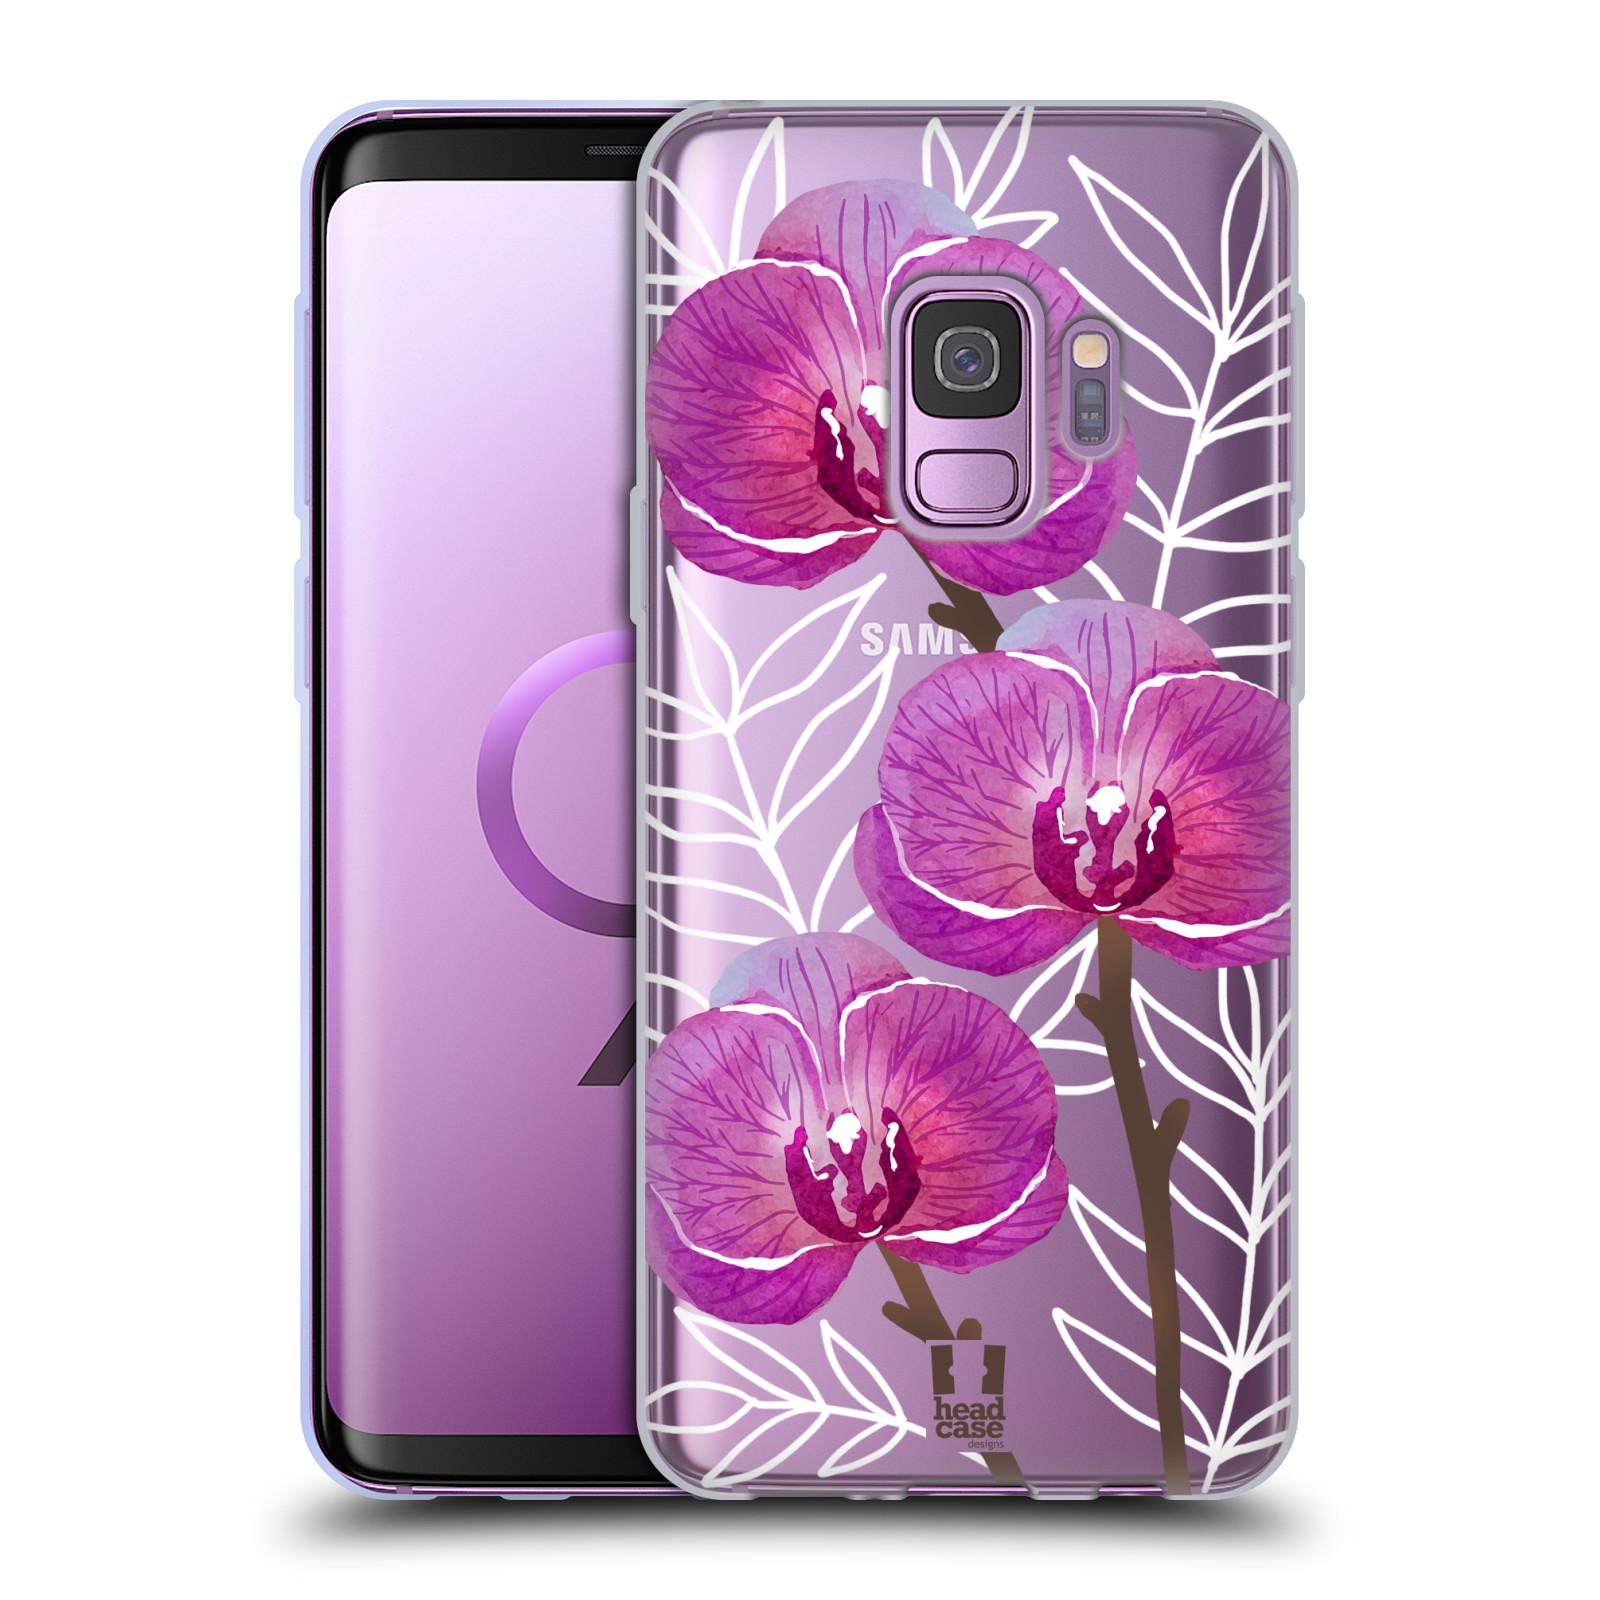 Silikonové pouzdro na mobil Samsung Galaxy S9 - Head Case - Hezoučké kvítky - průhledné